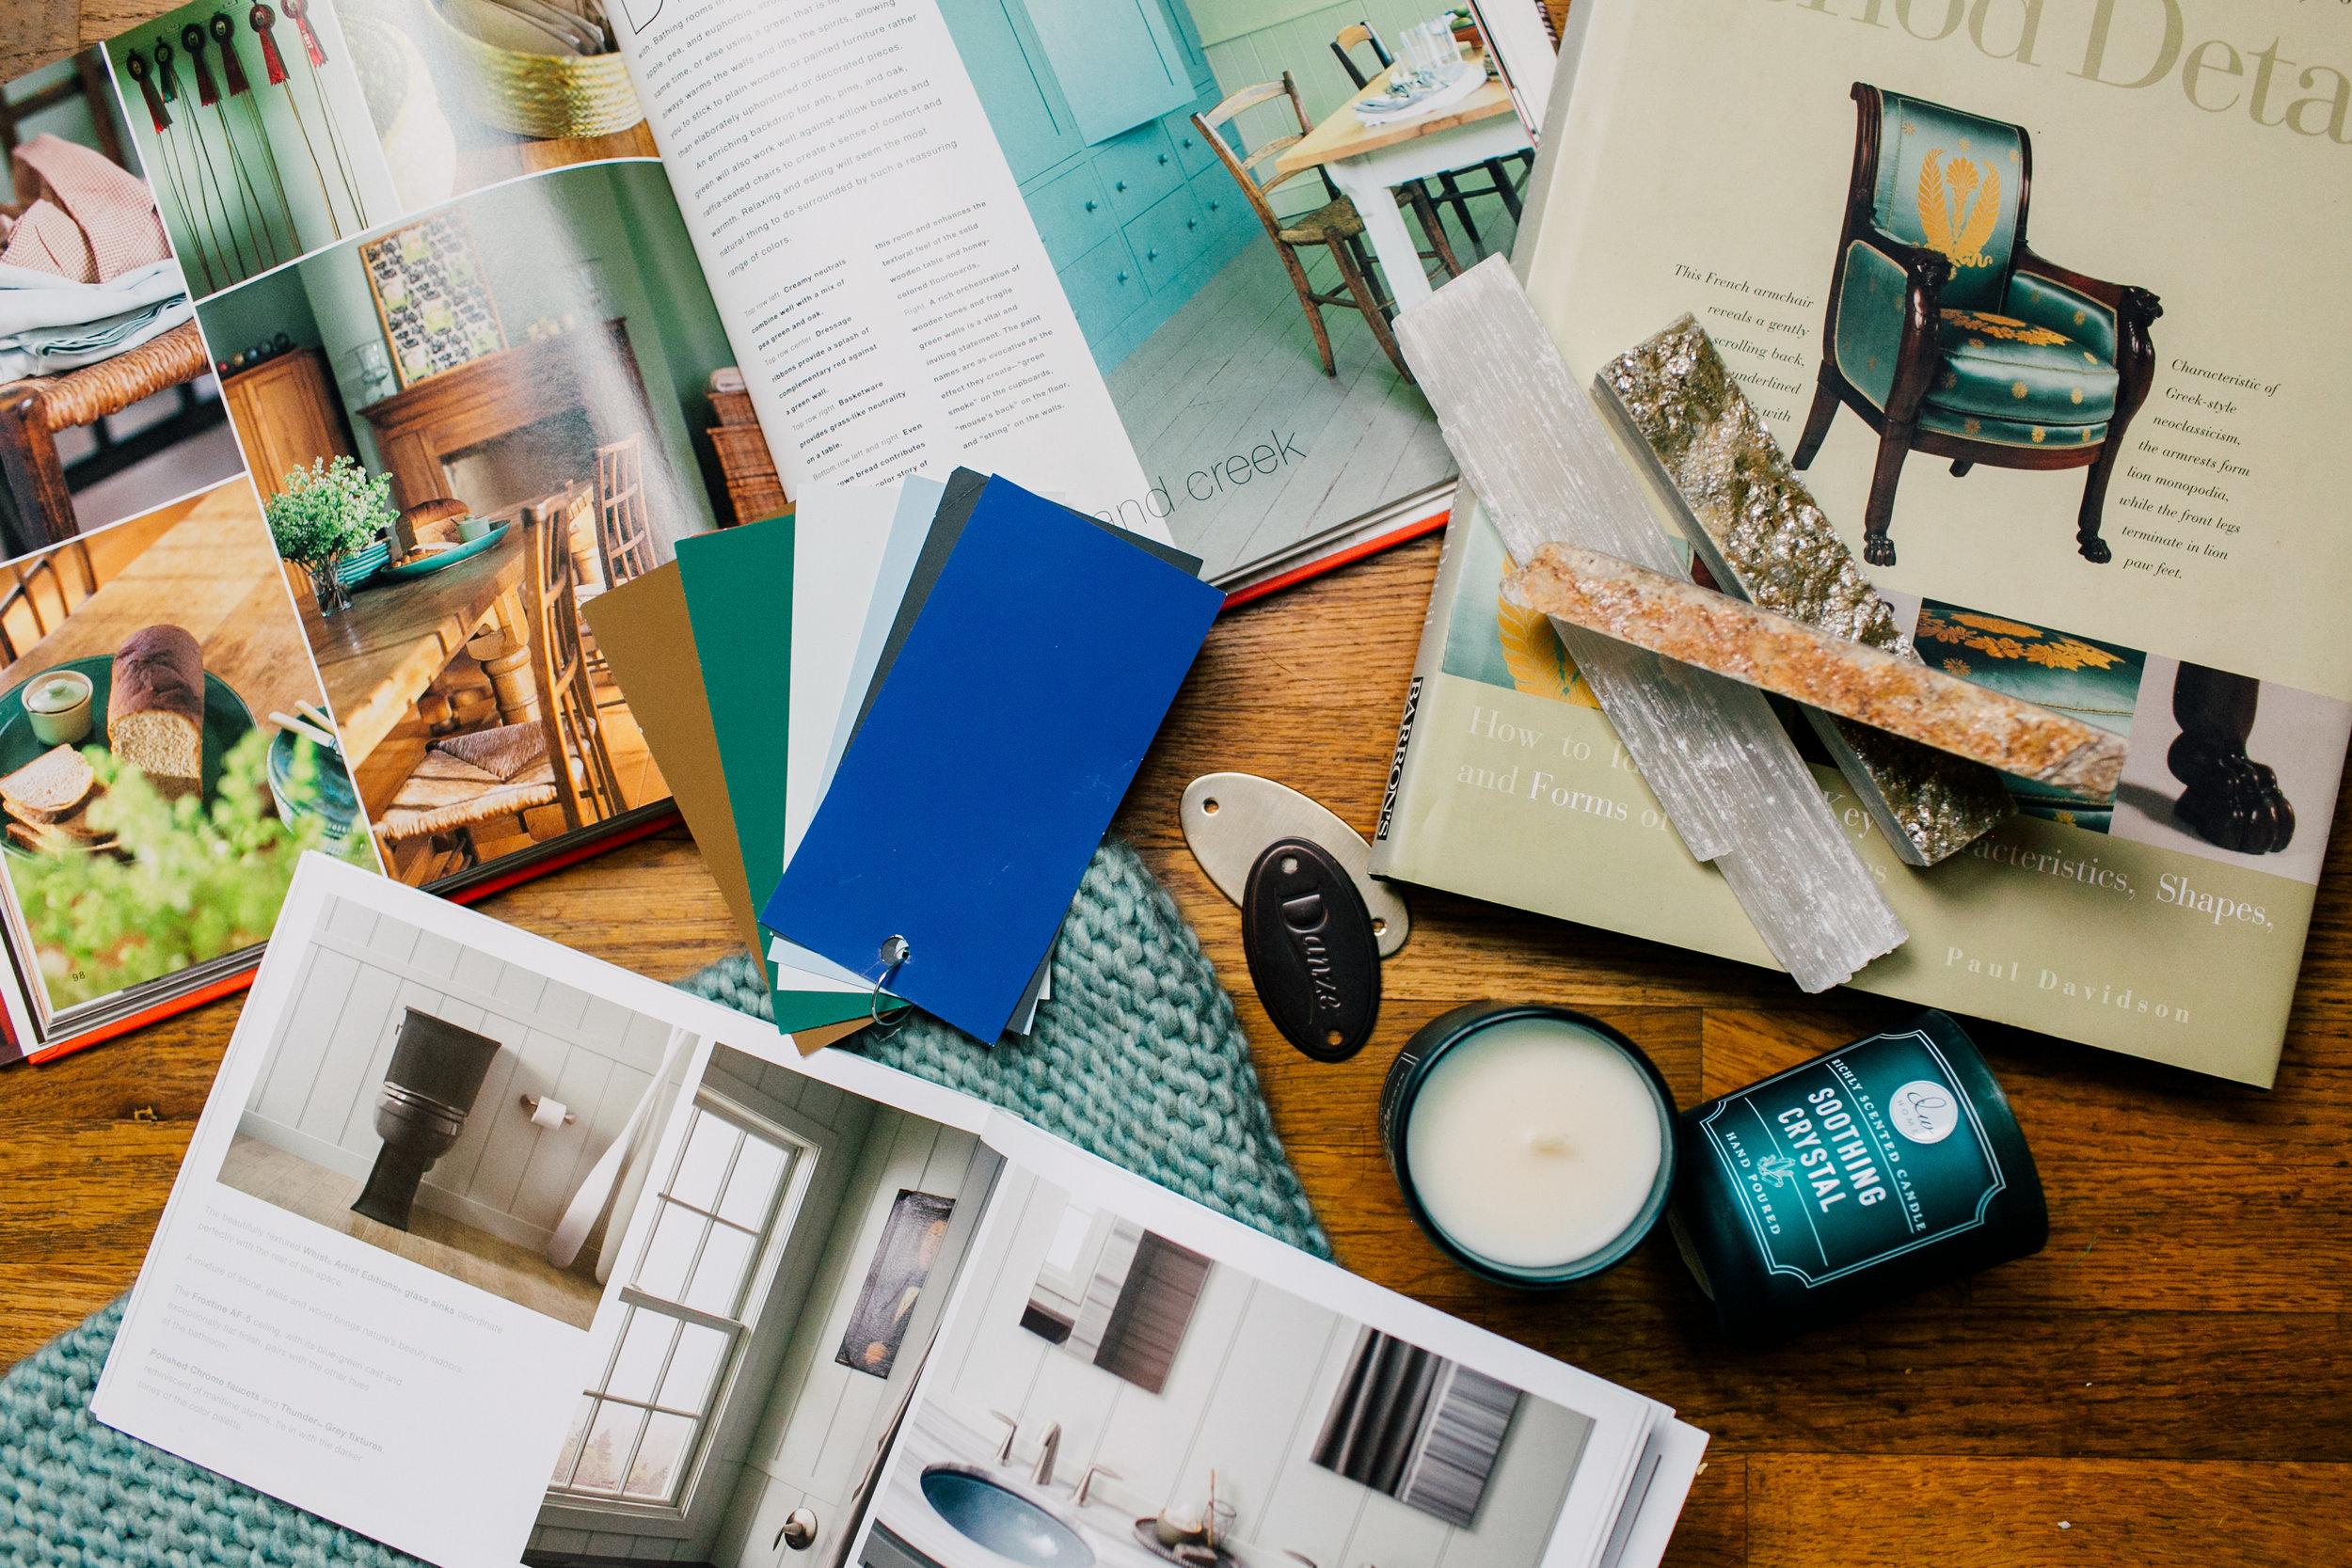 bellingham-marketing-photographer-katheryn-moran-fresh-space-redesign-100.jpg